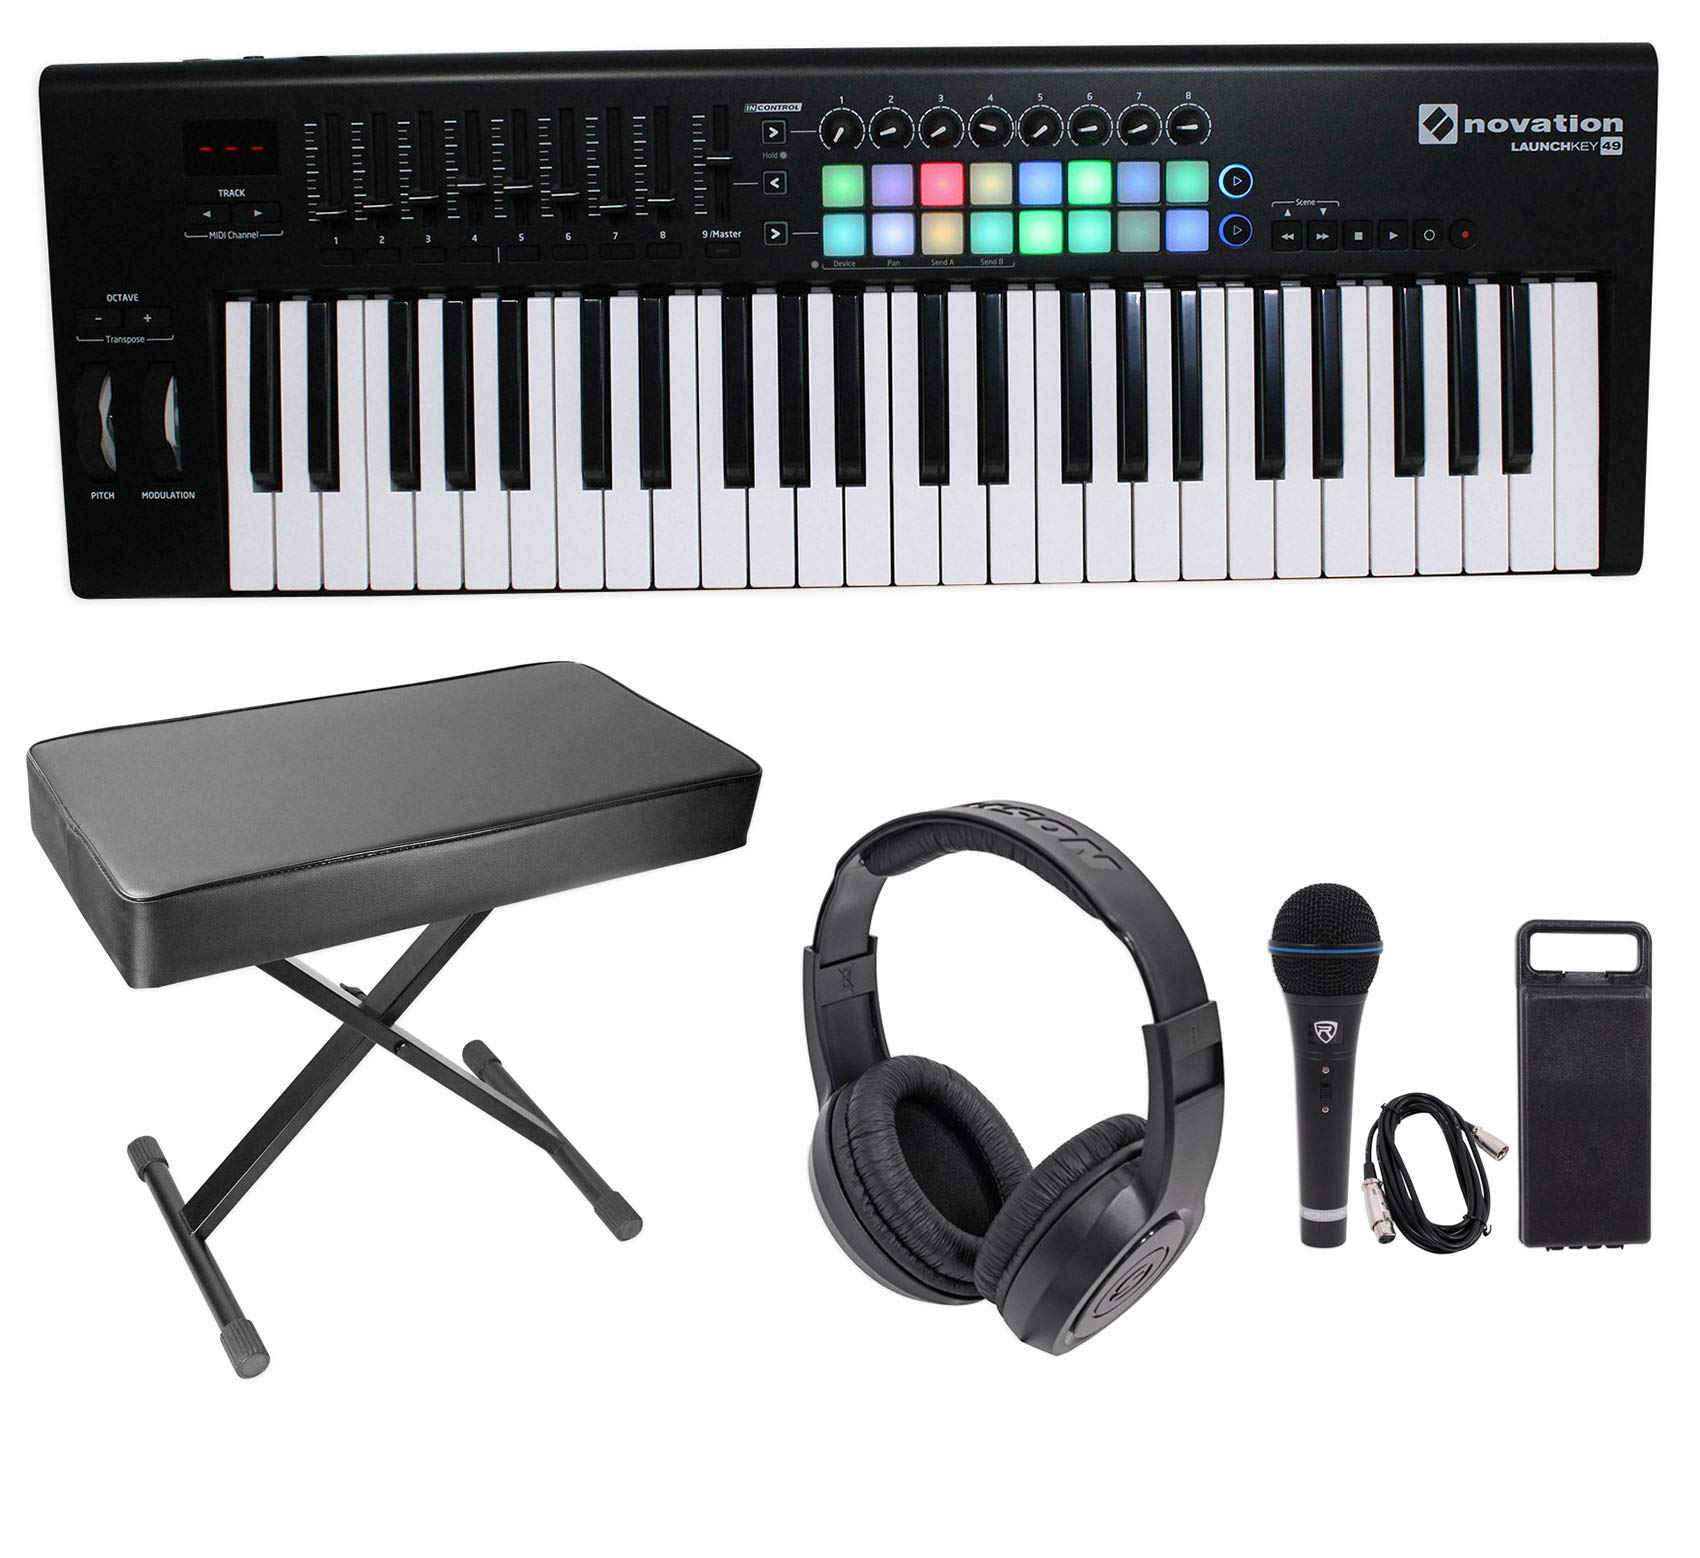 Novation LAUNCHKEY-49-MK2 49-Key Keyboard Controller+Bench+Headphones+Mic+Cable by Novation